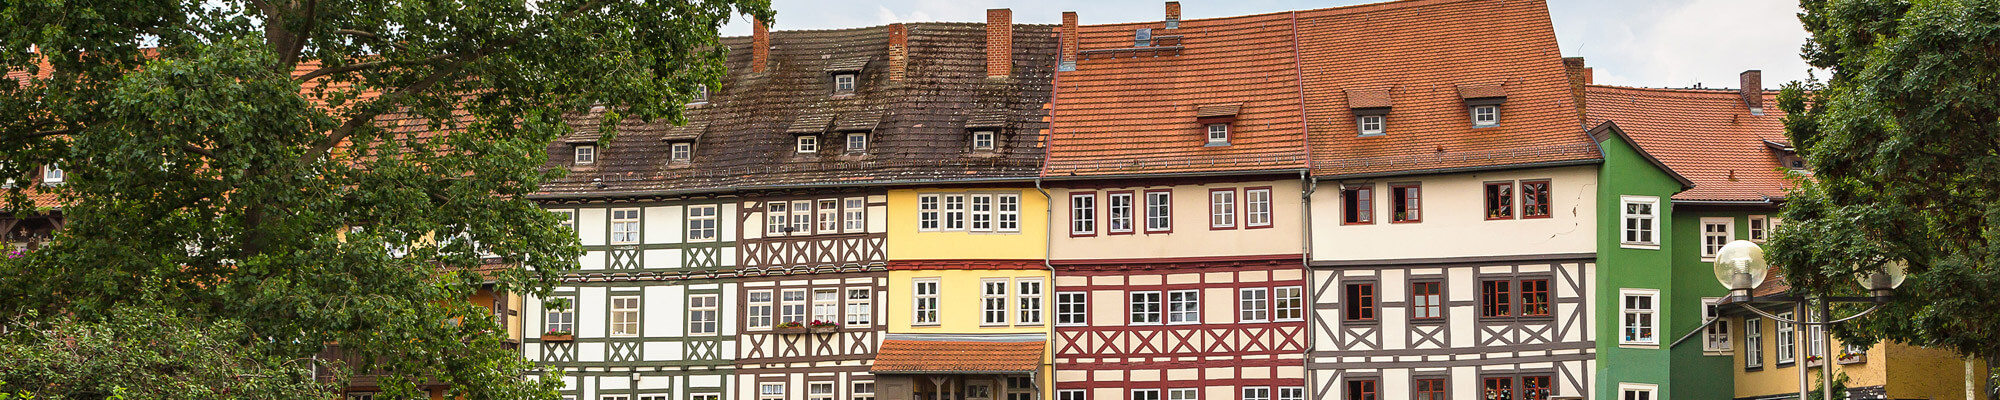 Erfurt-04